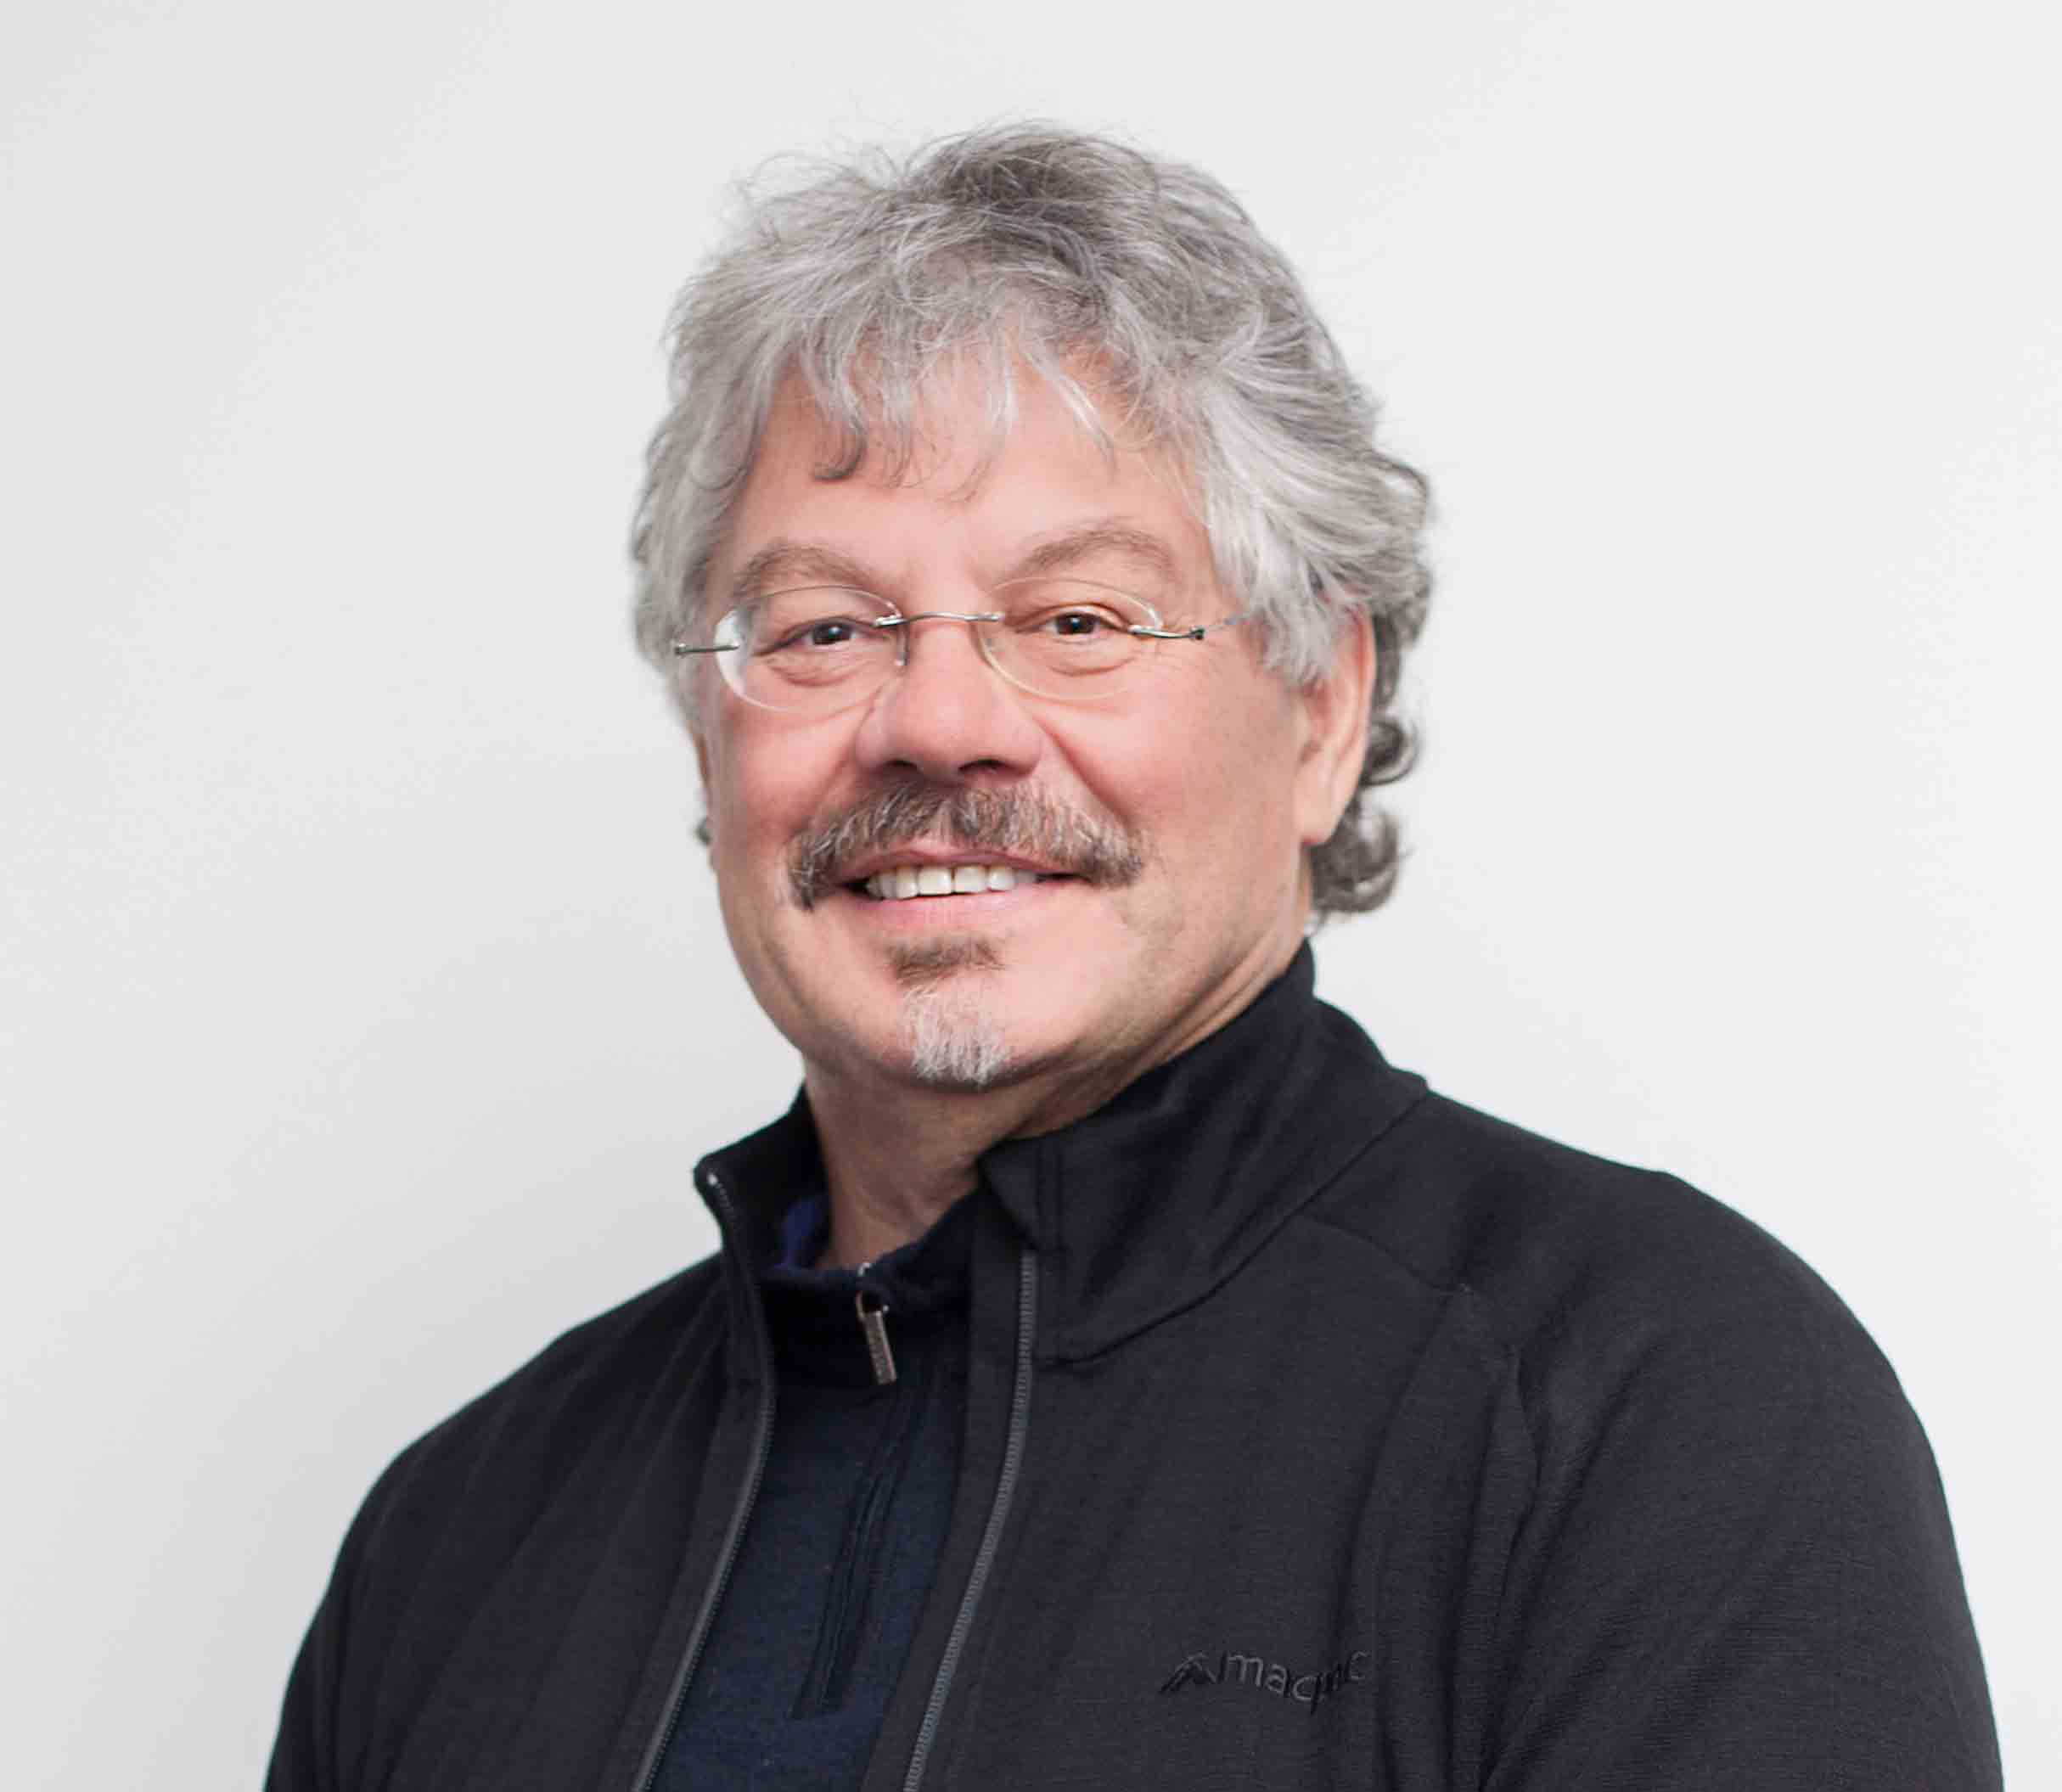 Craig Ellison